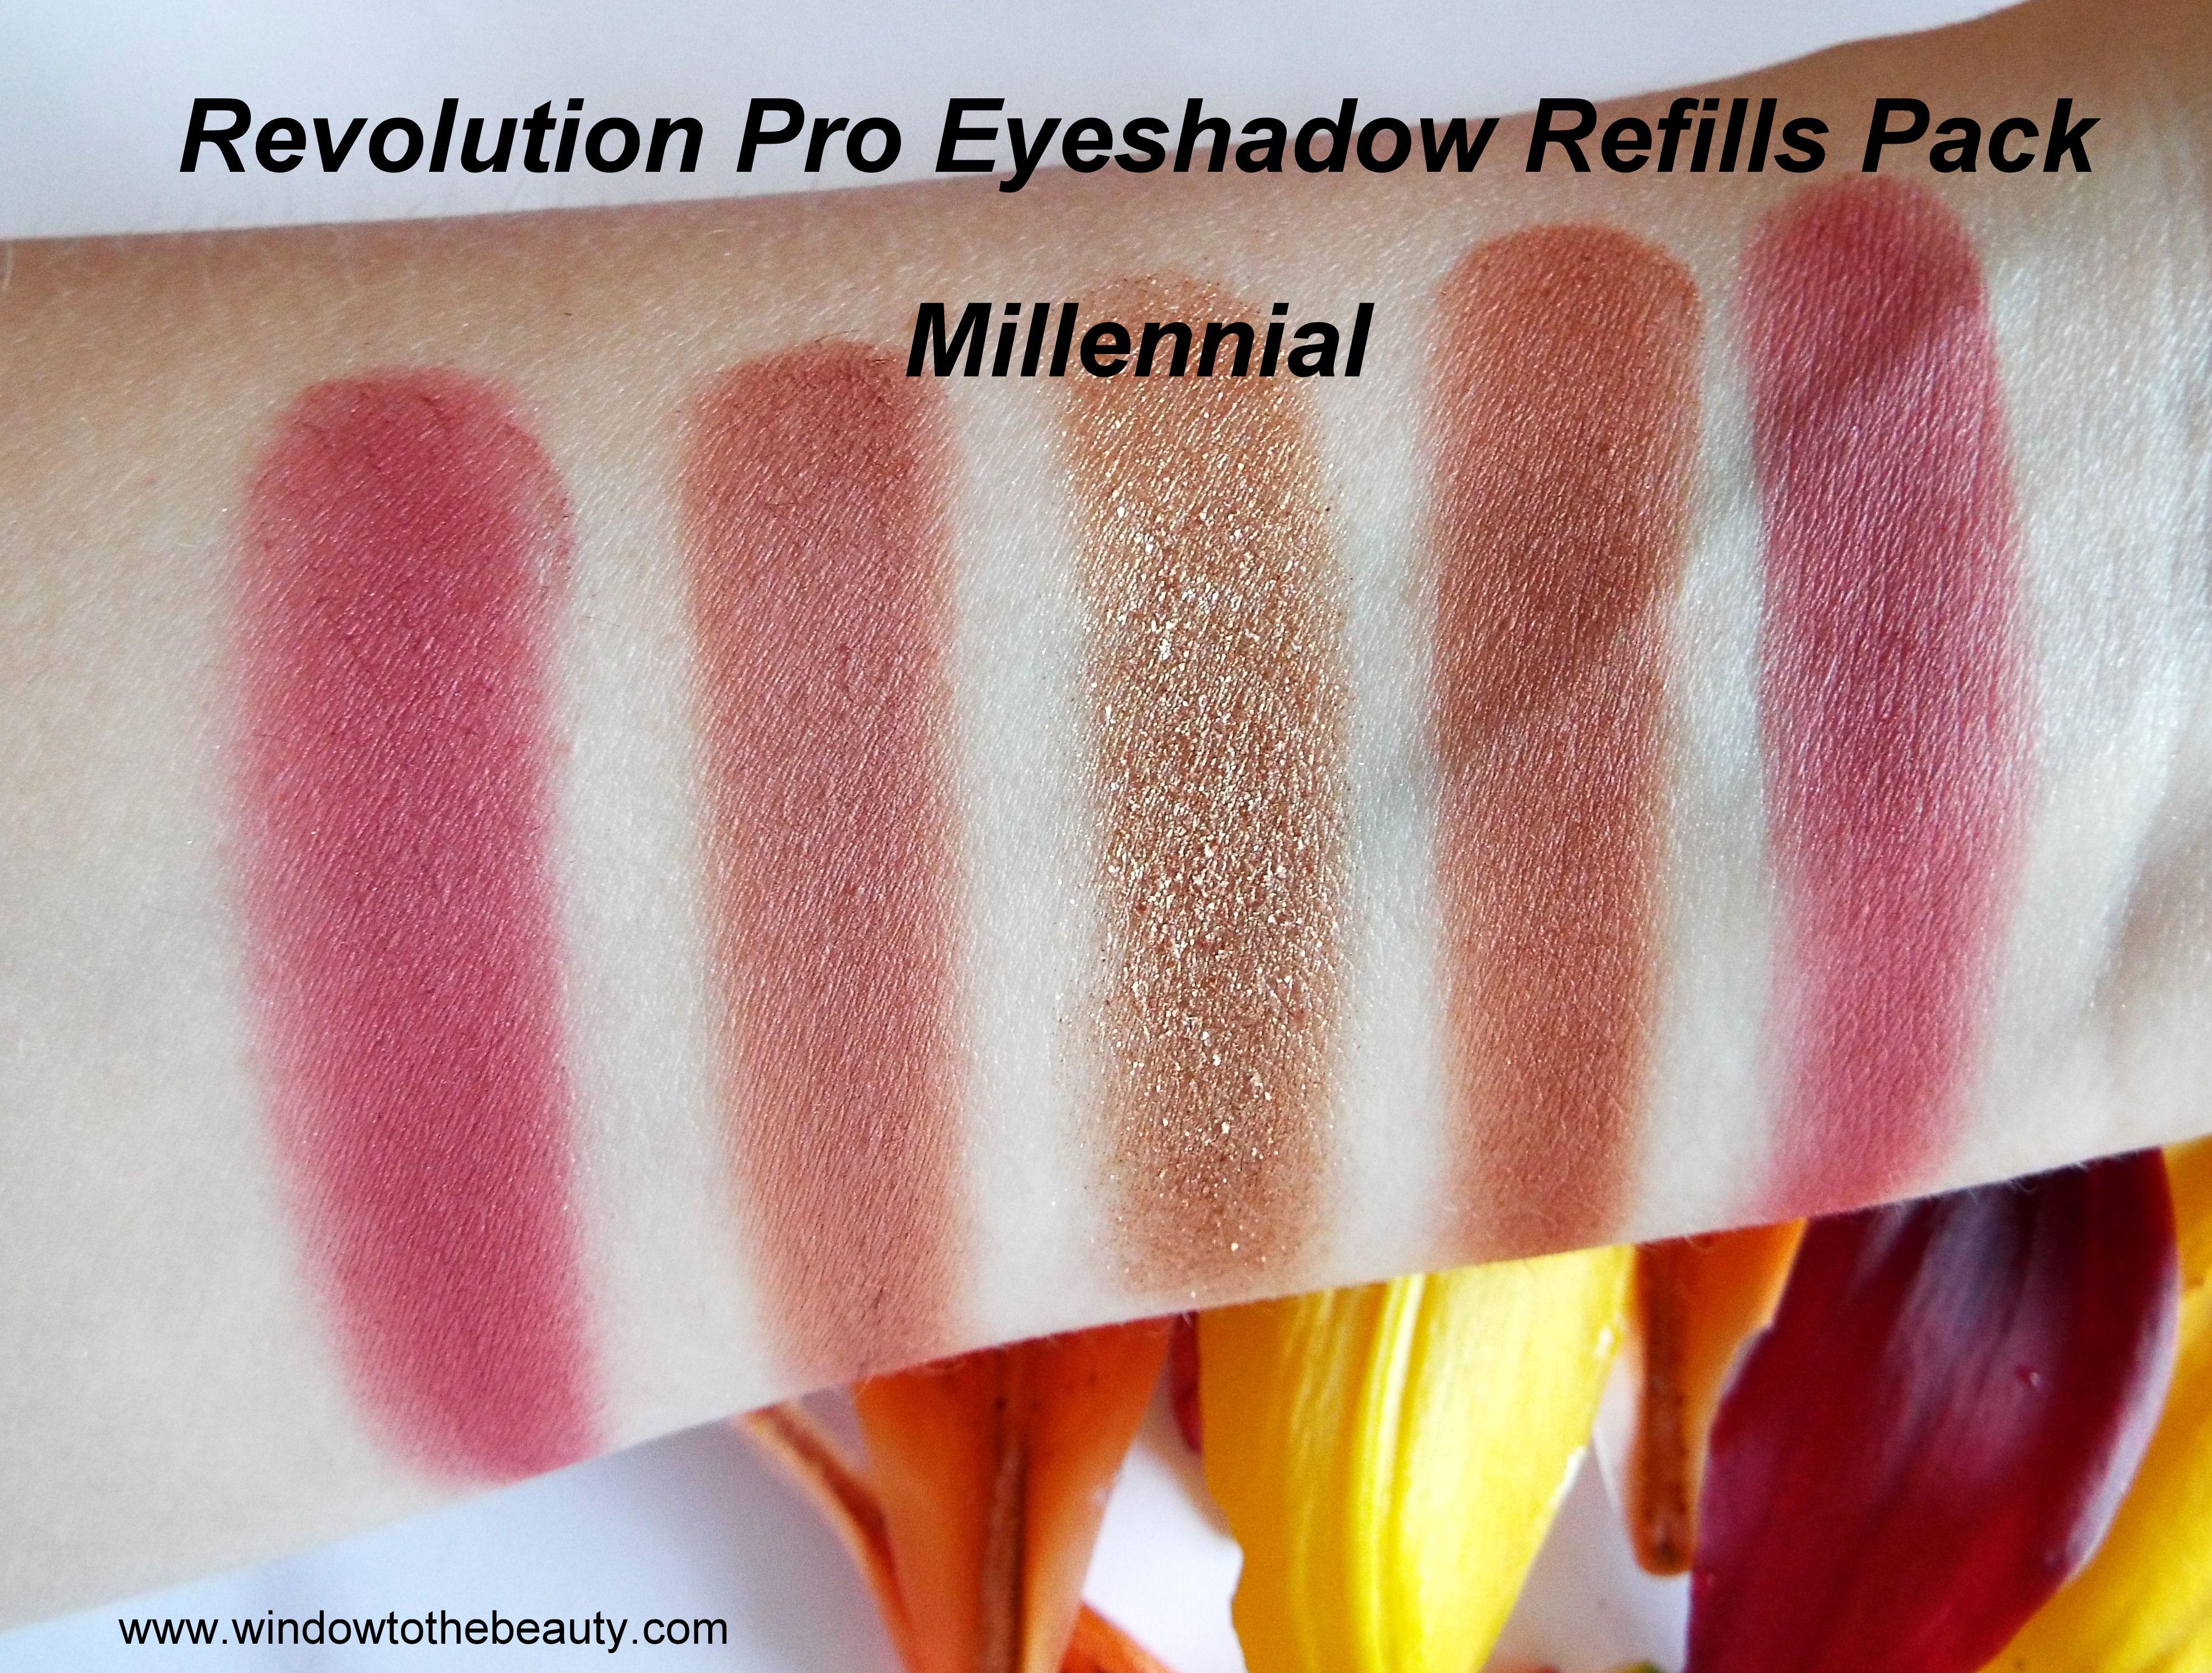 Revolution Pro Eyeshadow Refills Pack Eyeshadow, Refill